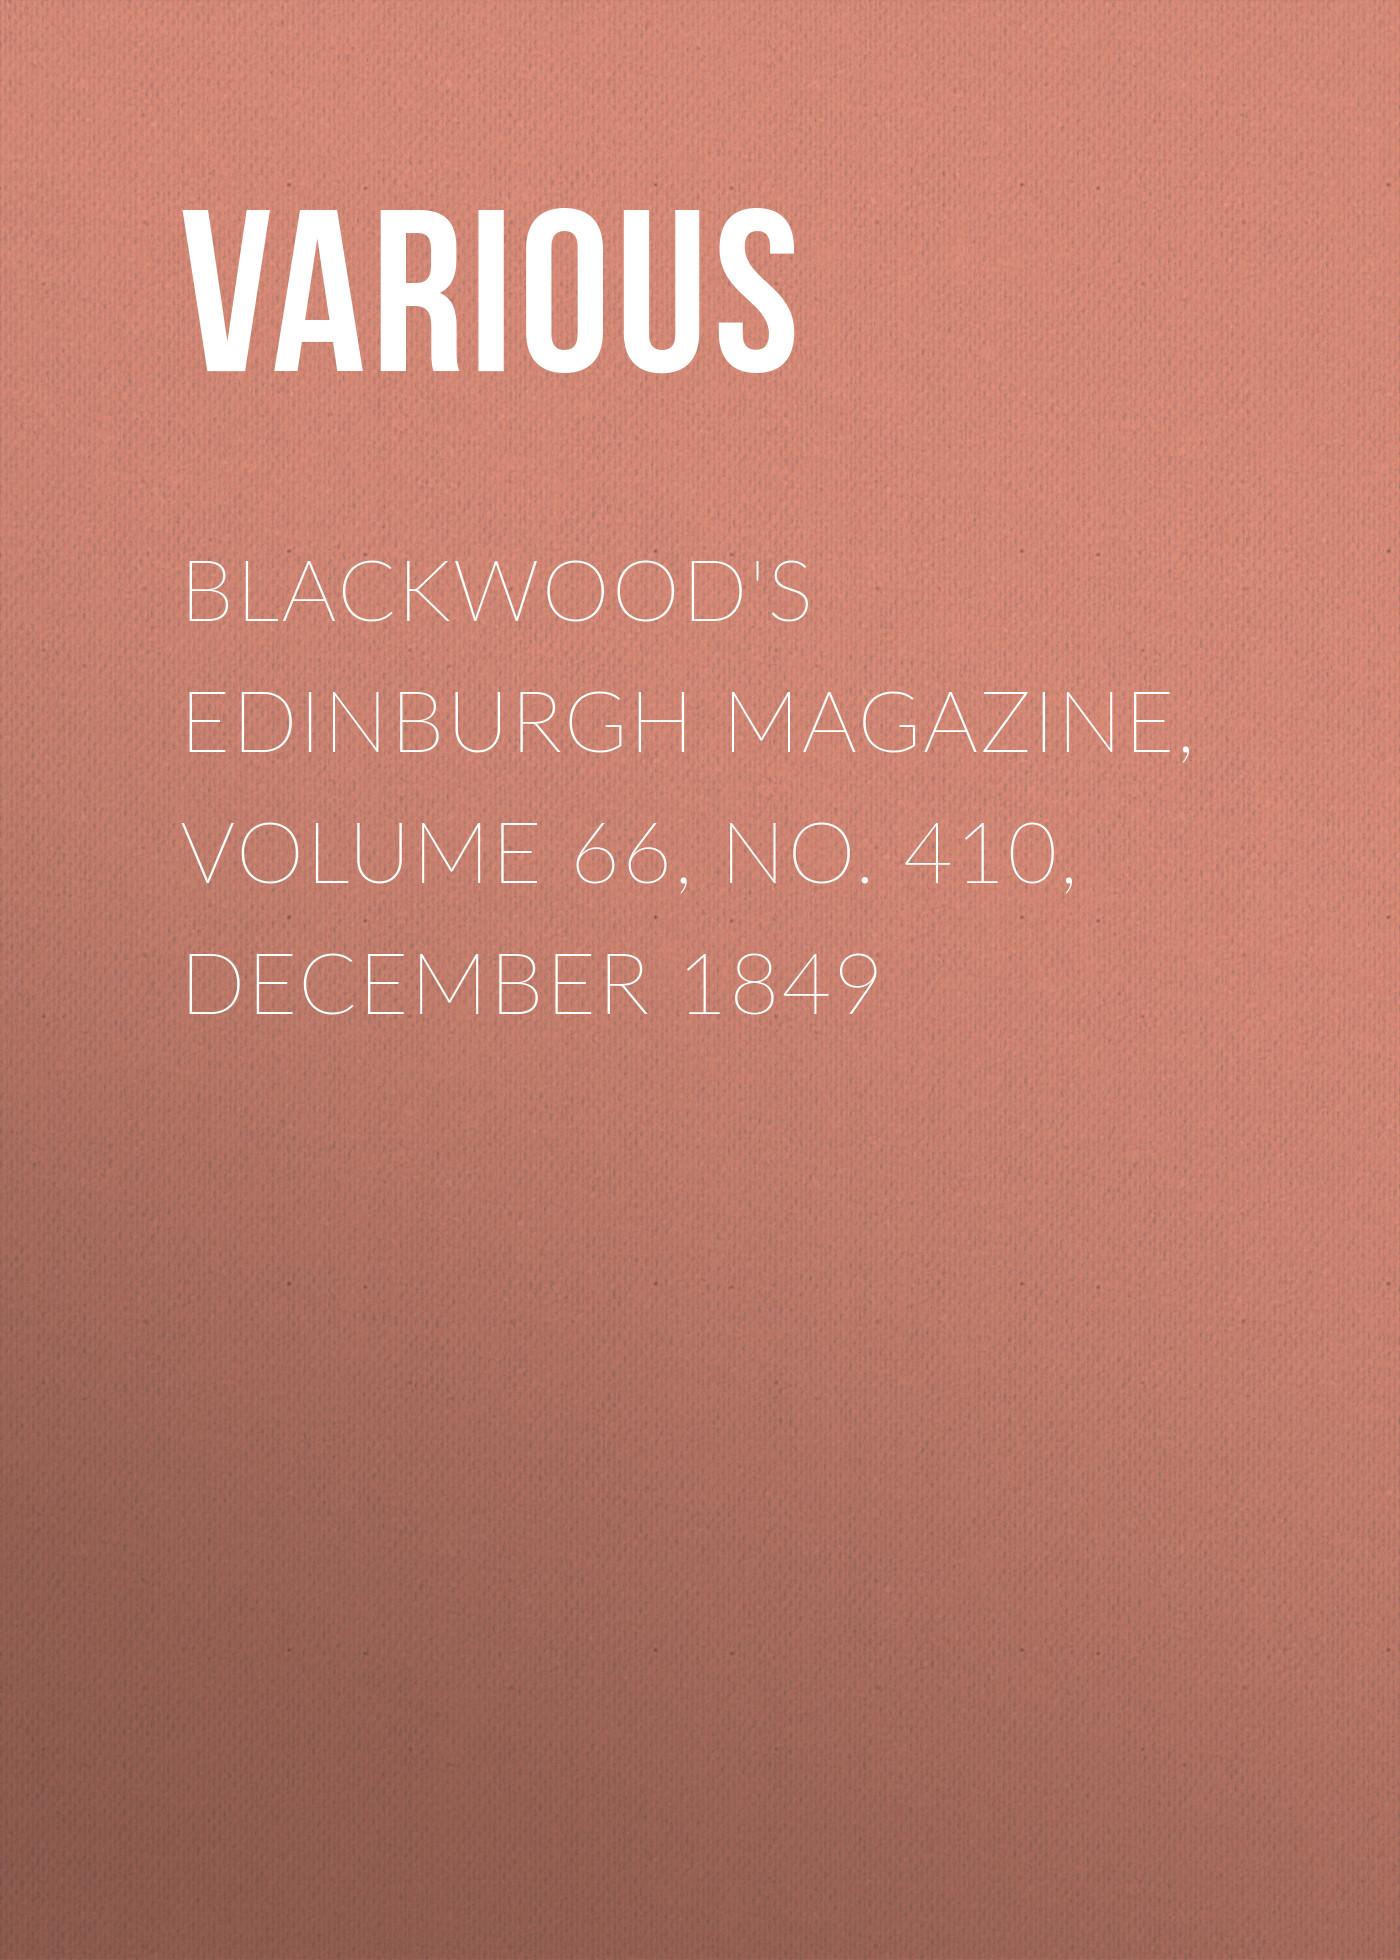 Various Blackwood's Edinburgh Magazine, Volume 66, No. 410, December 1849 various blackwood s edinburgh magazine no 404 june 1849